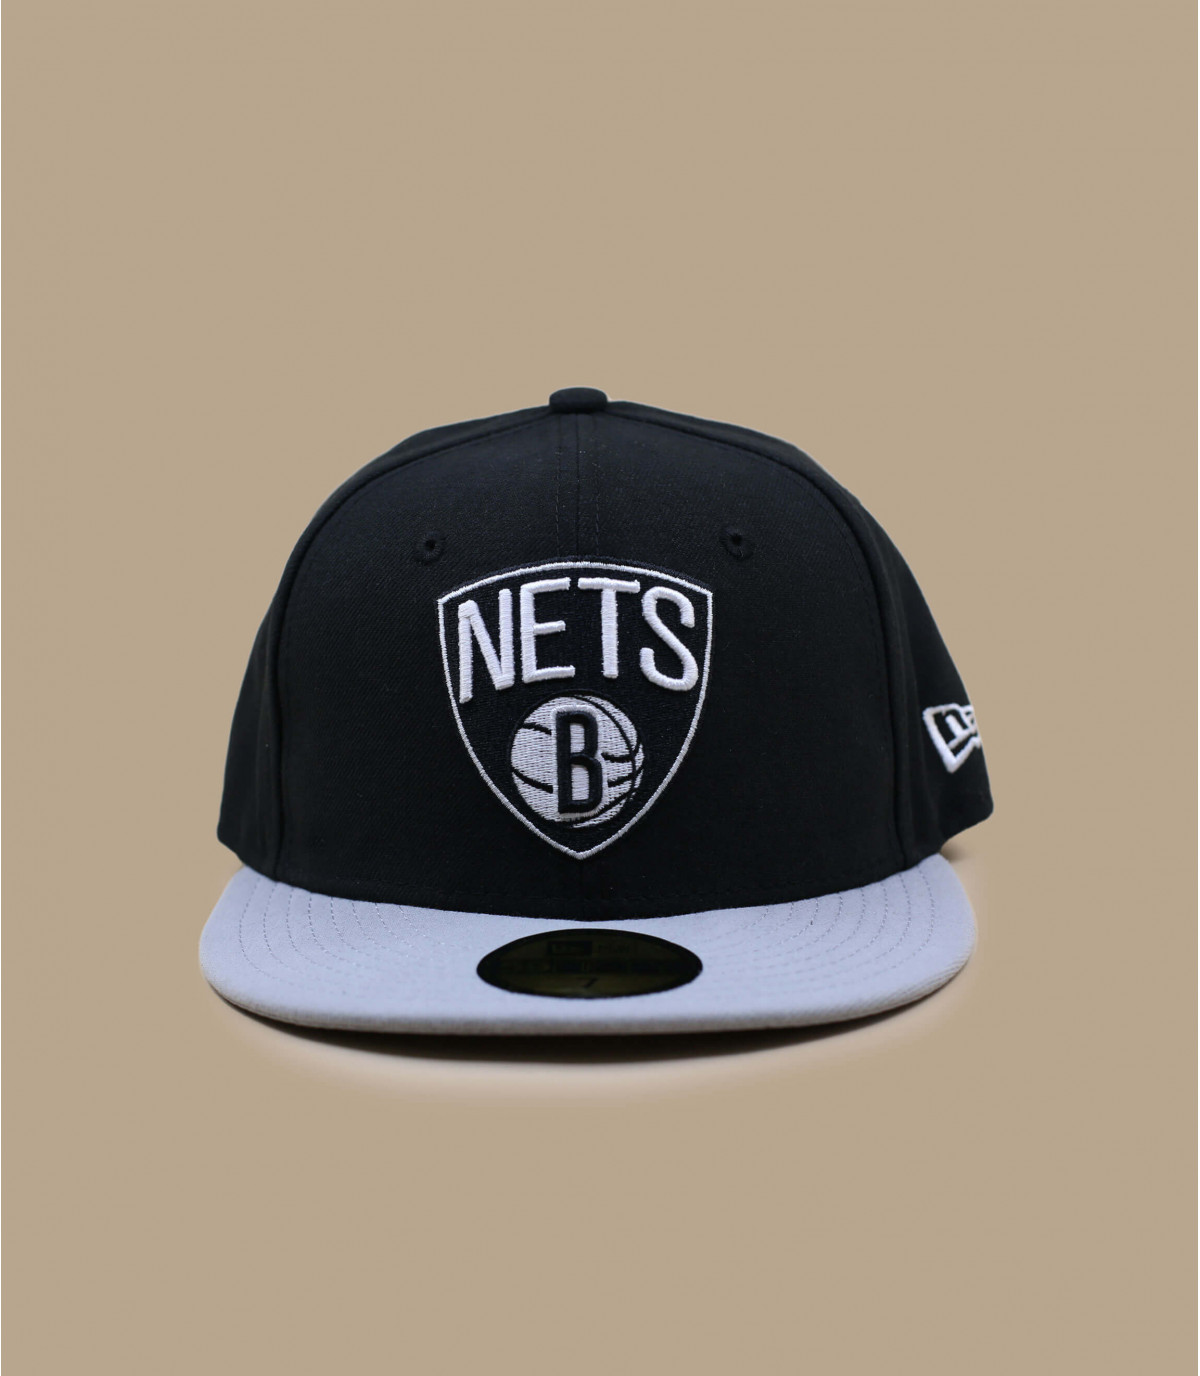 Black grey nets cap